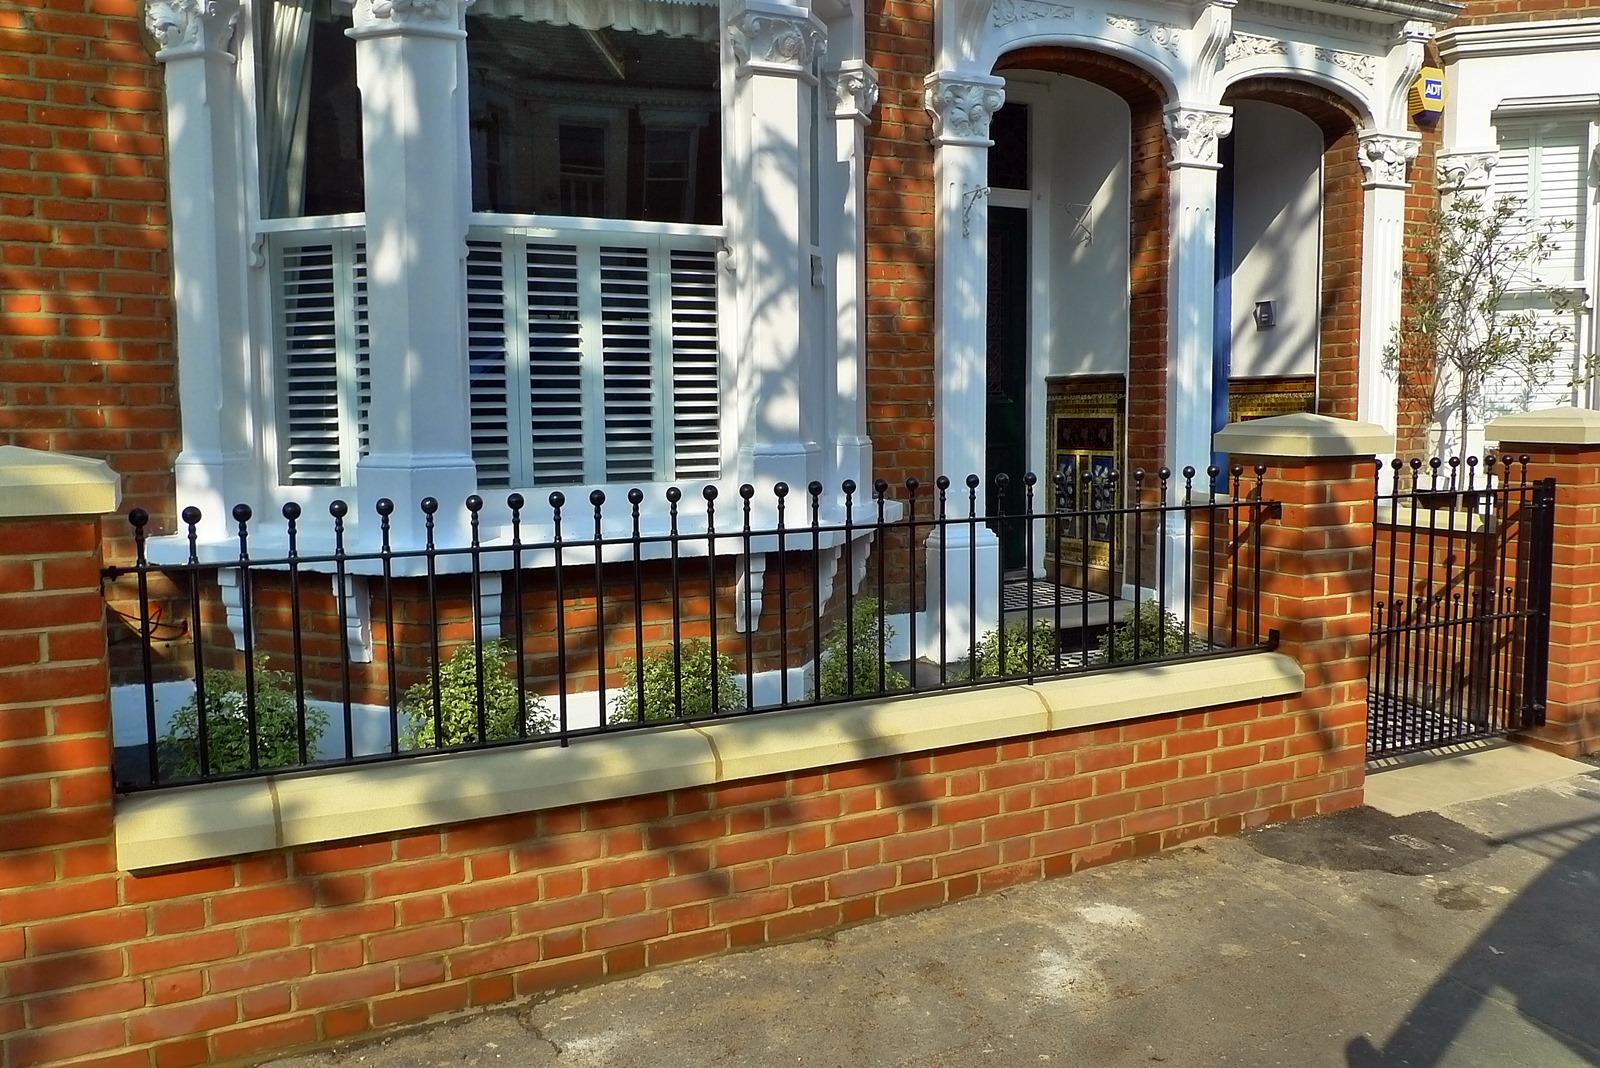 Clapham Balham Victorian Mosaic Tile Path Black And White